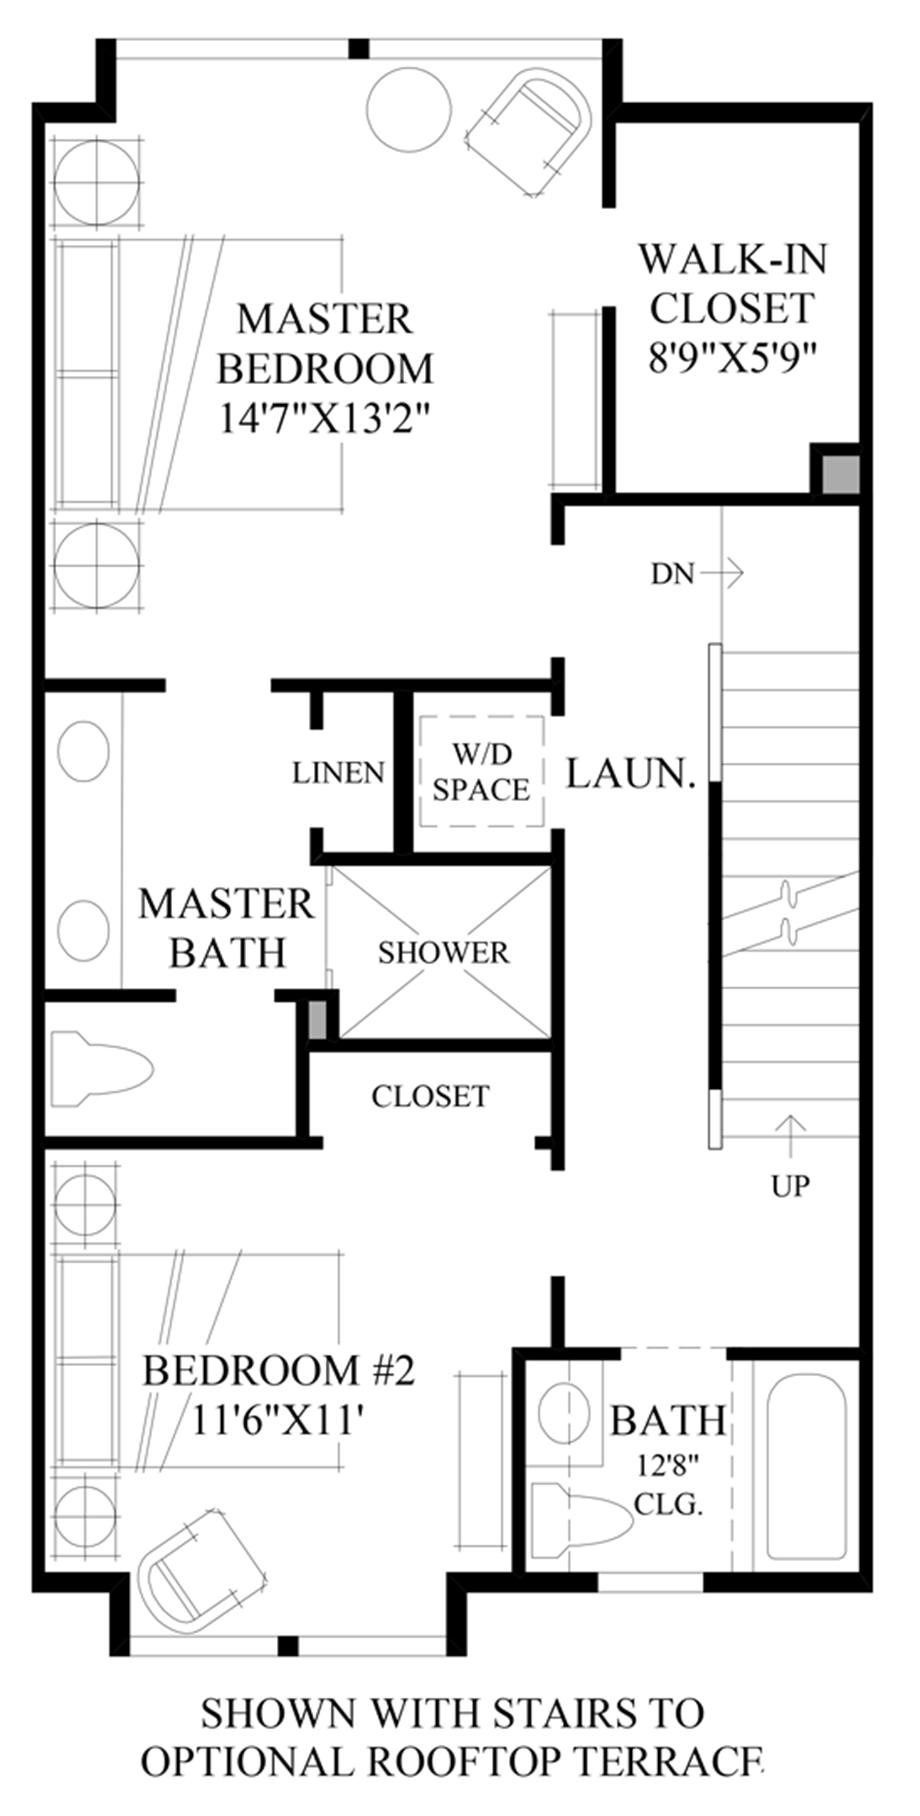 Optional Stairs to Rooftop Terrace Floor Plan